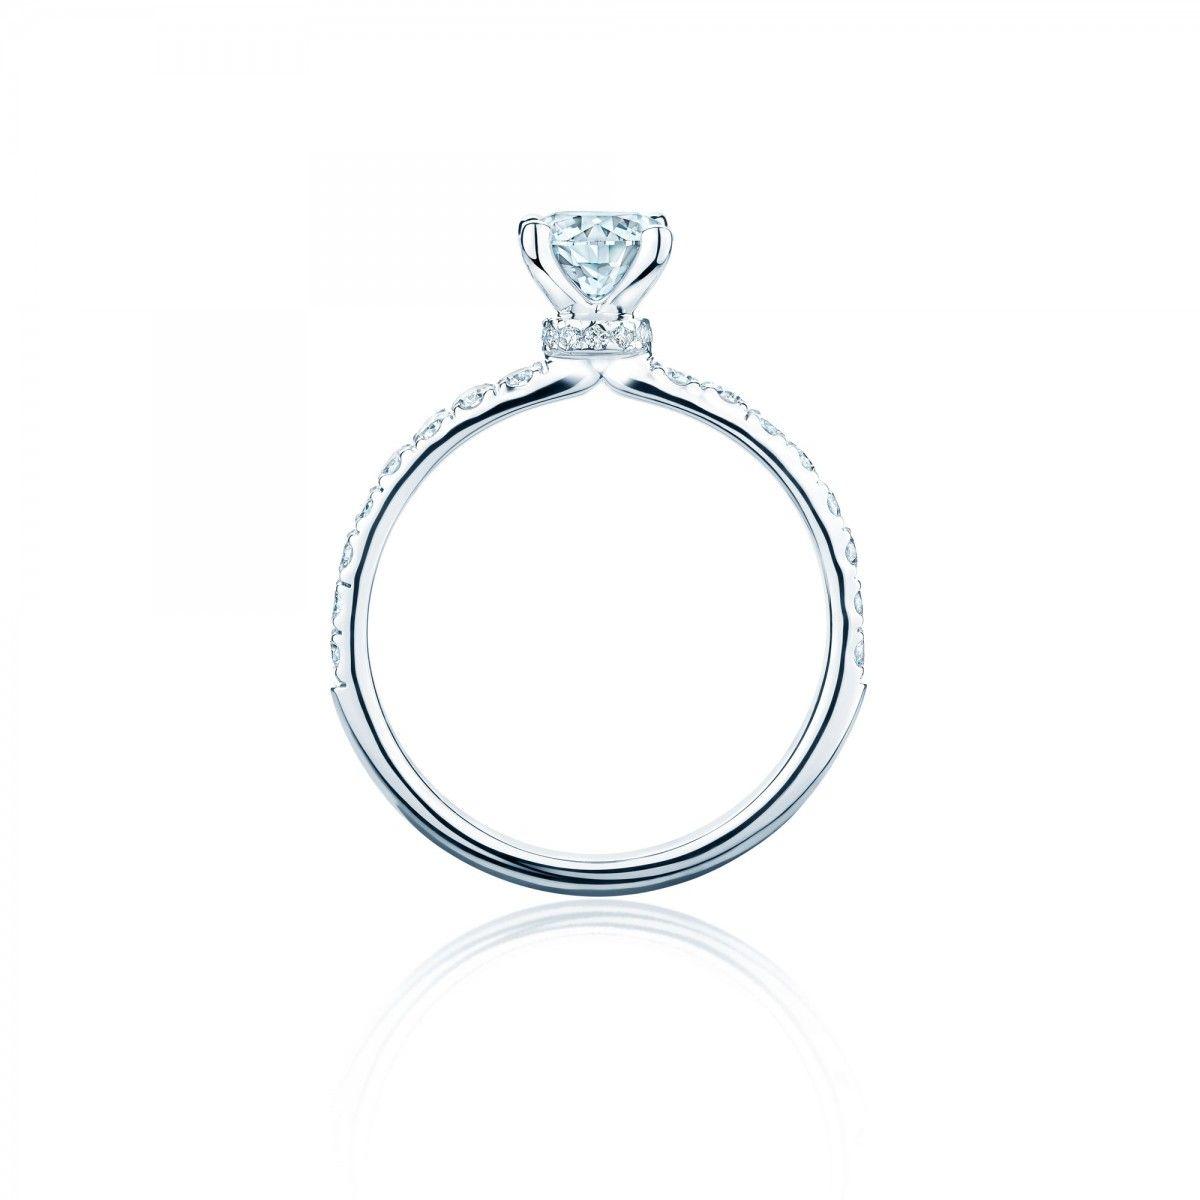 Birks Deco Canadian Diamond Pave Engagement Ring Engagement Rings Pave Diamond Engagement Rings Pave Engagement Ring